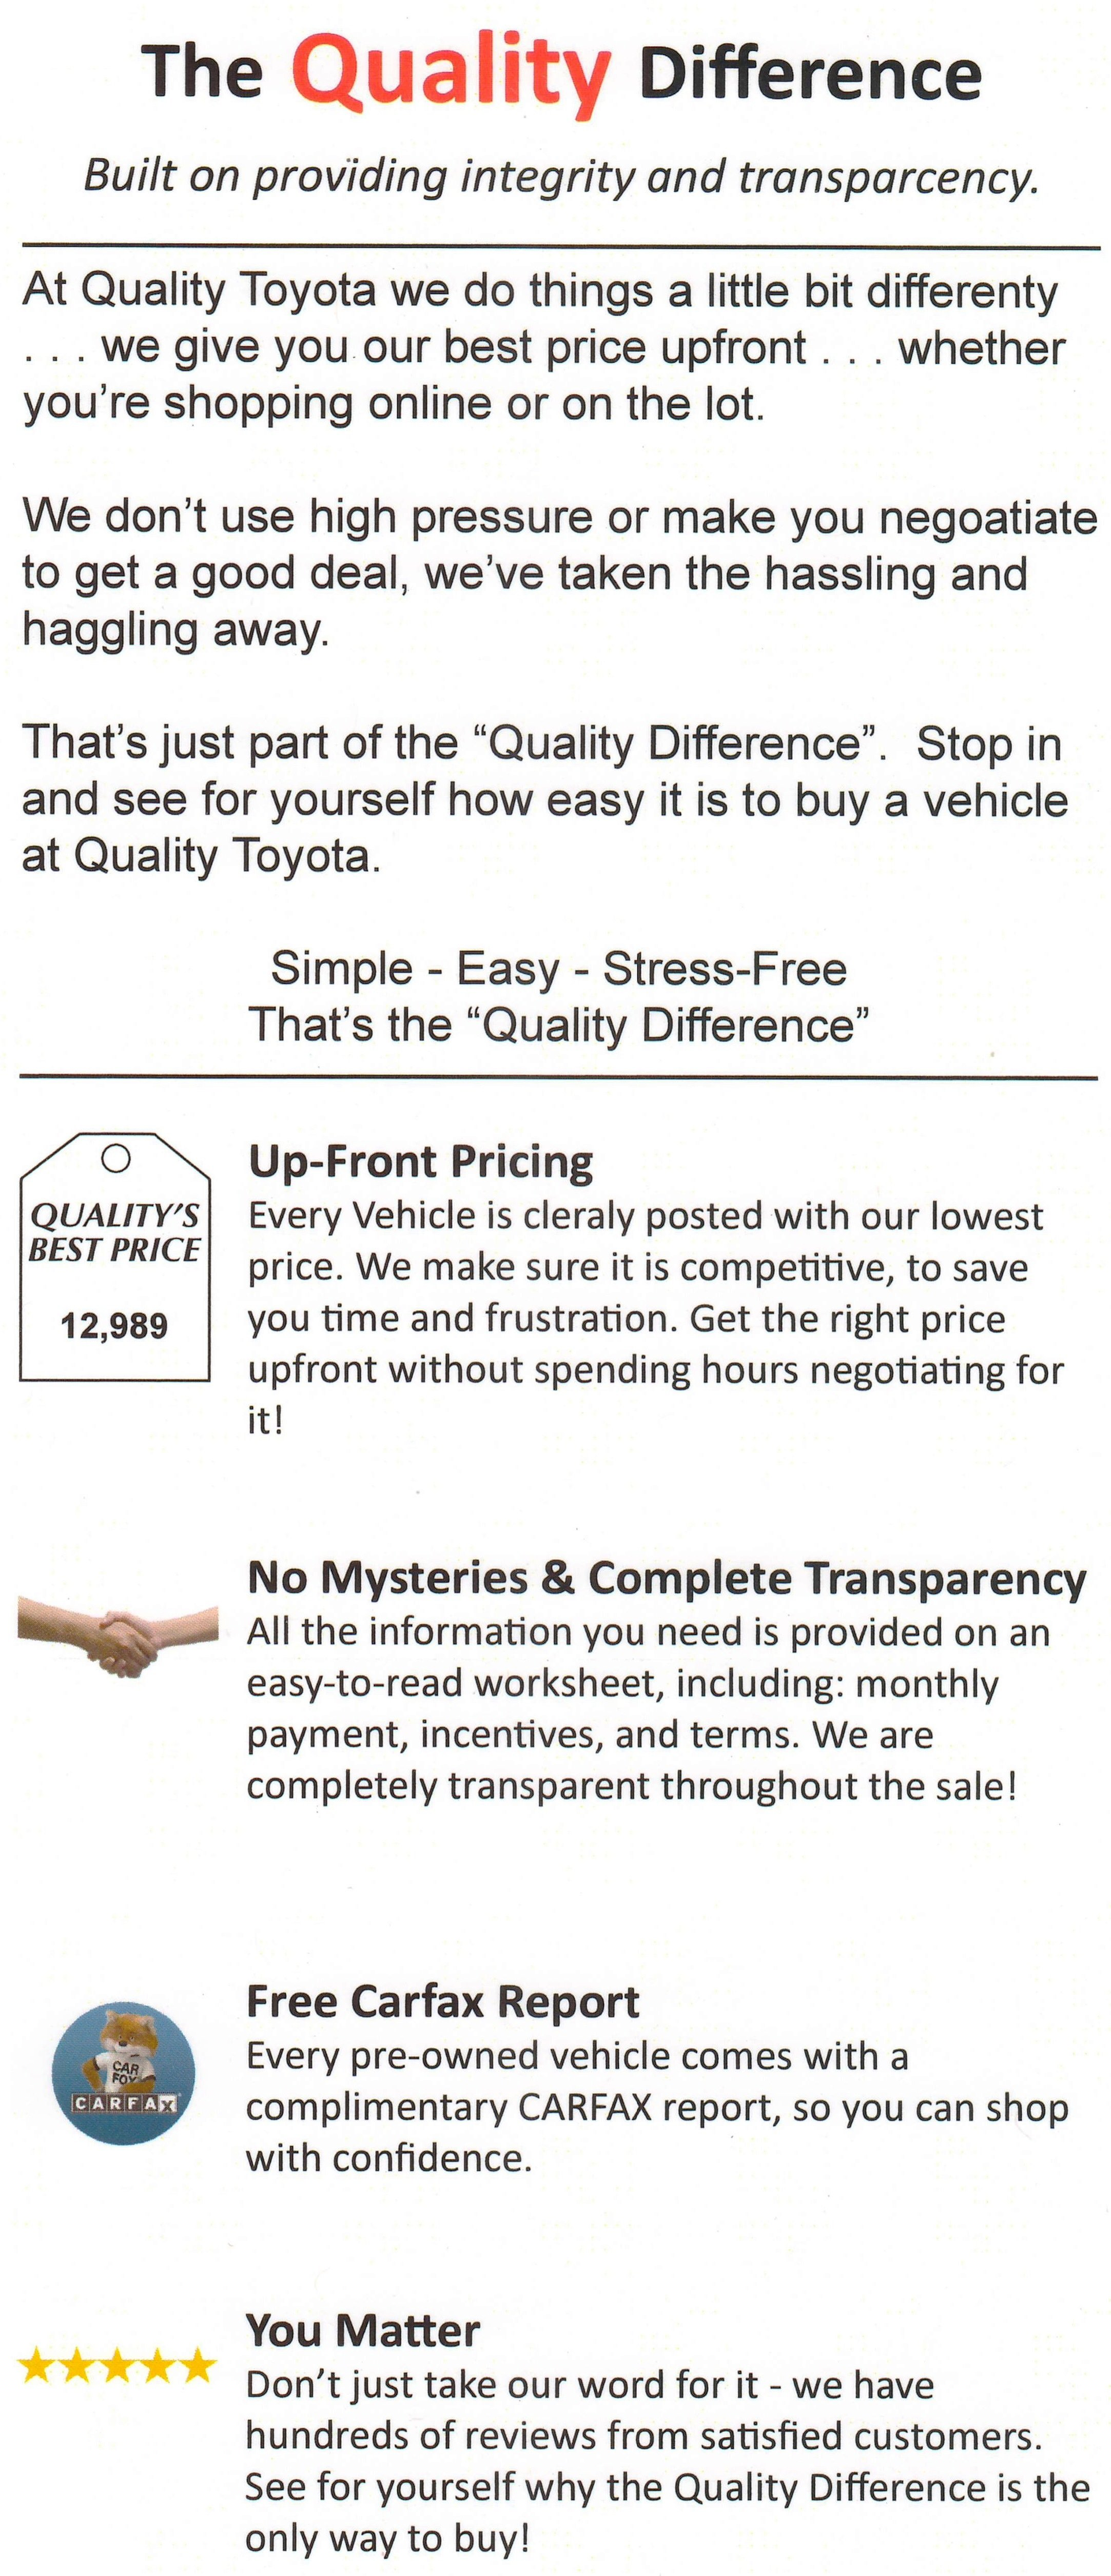 Fergus Falls MN Toyota Dealer | Sales, Service, Parts Near Fargo, Moorhead |